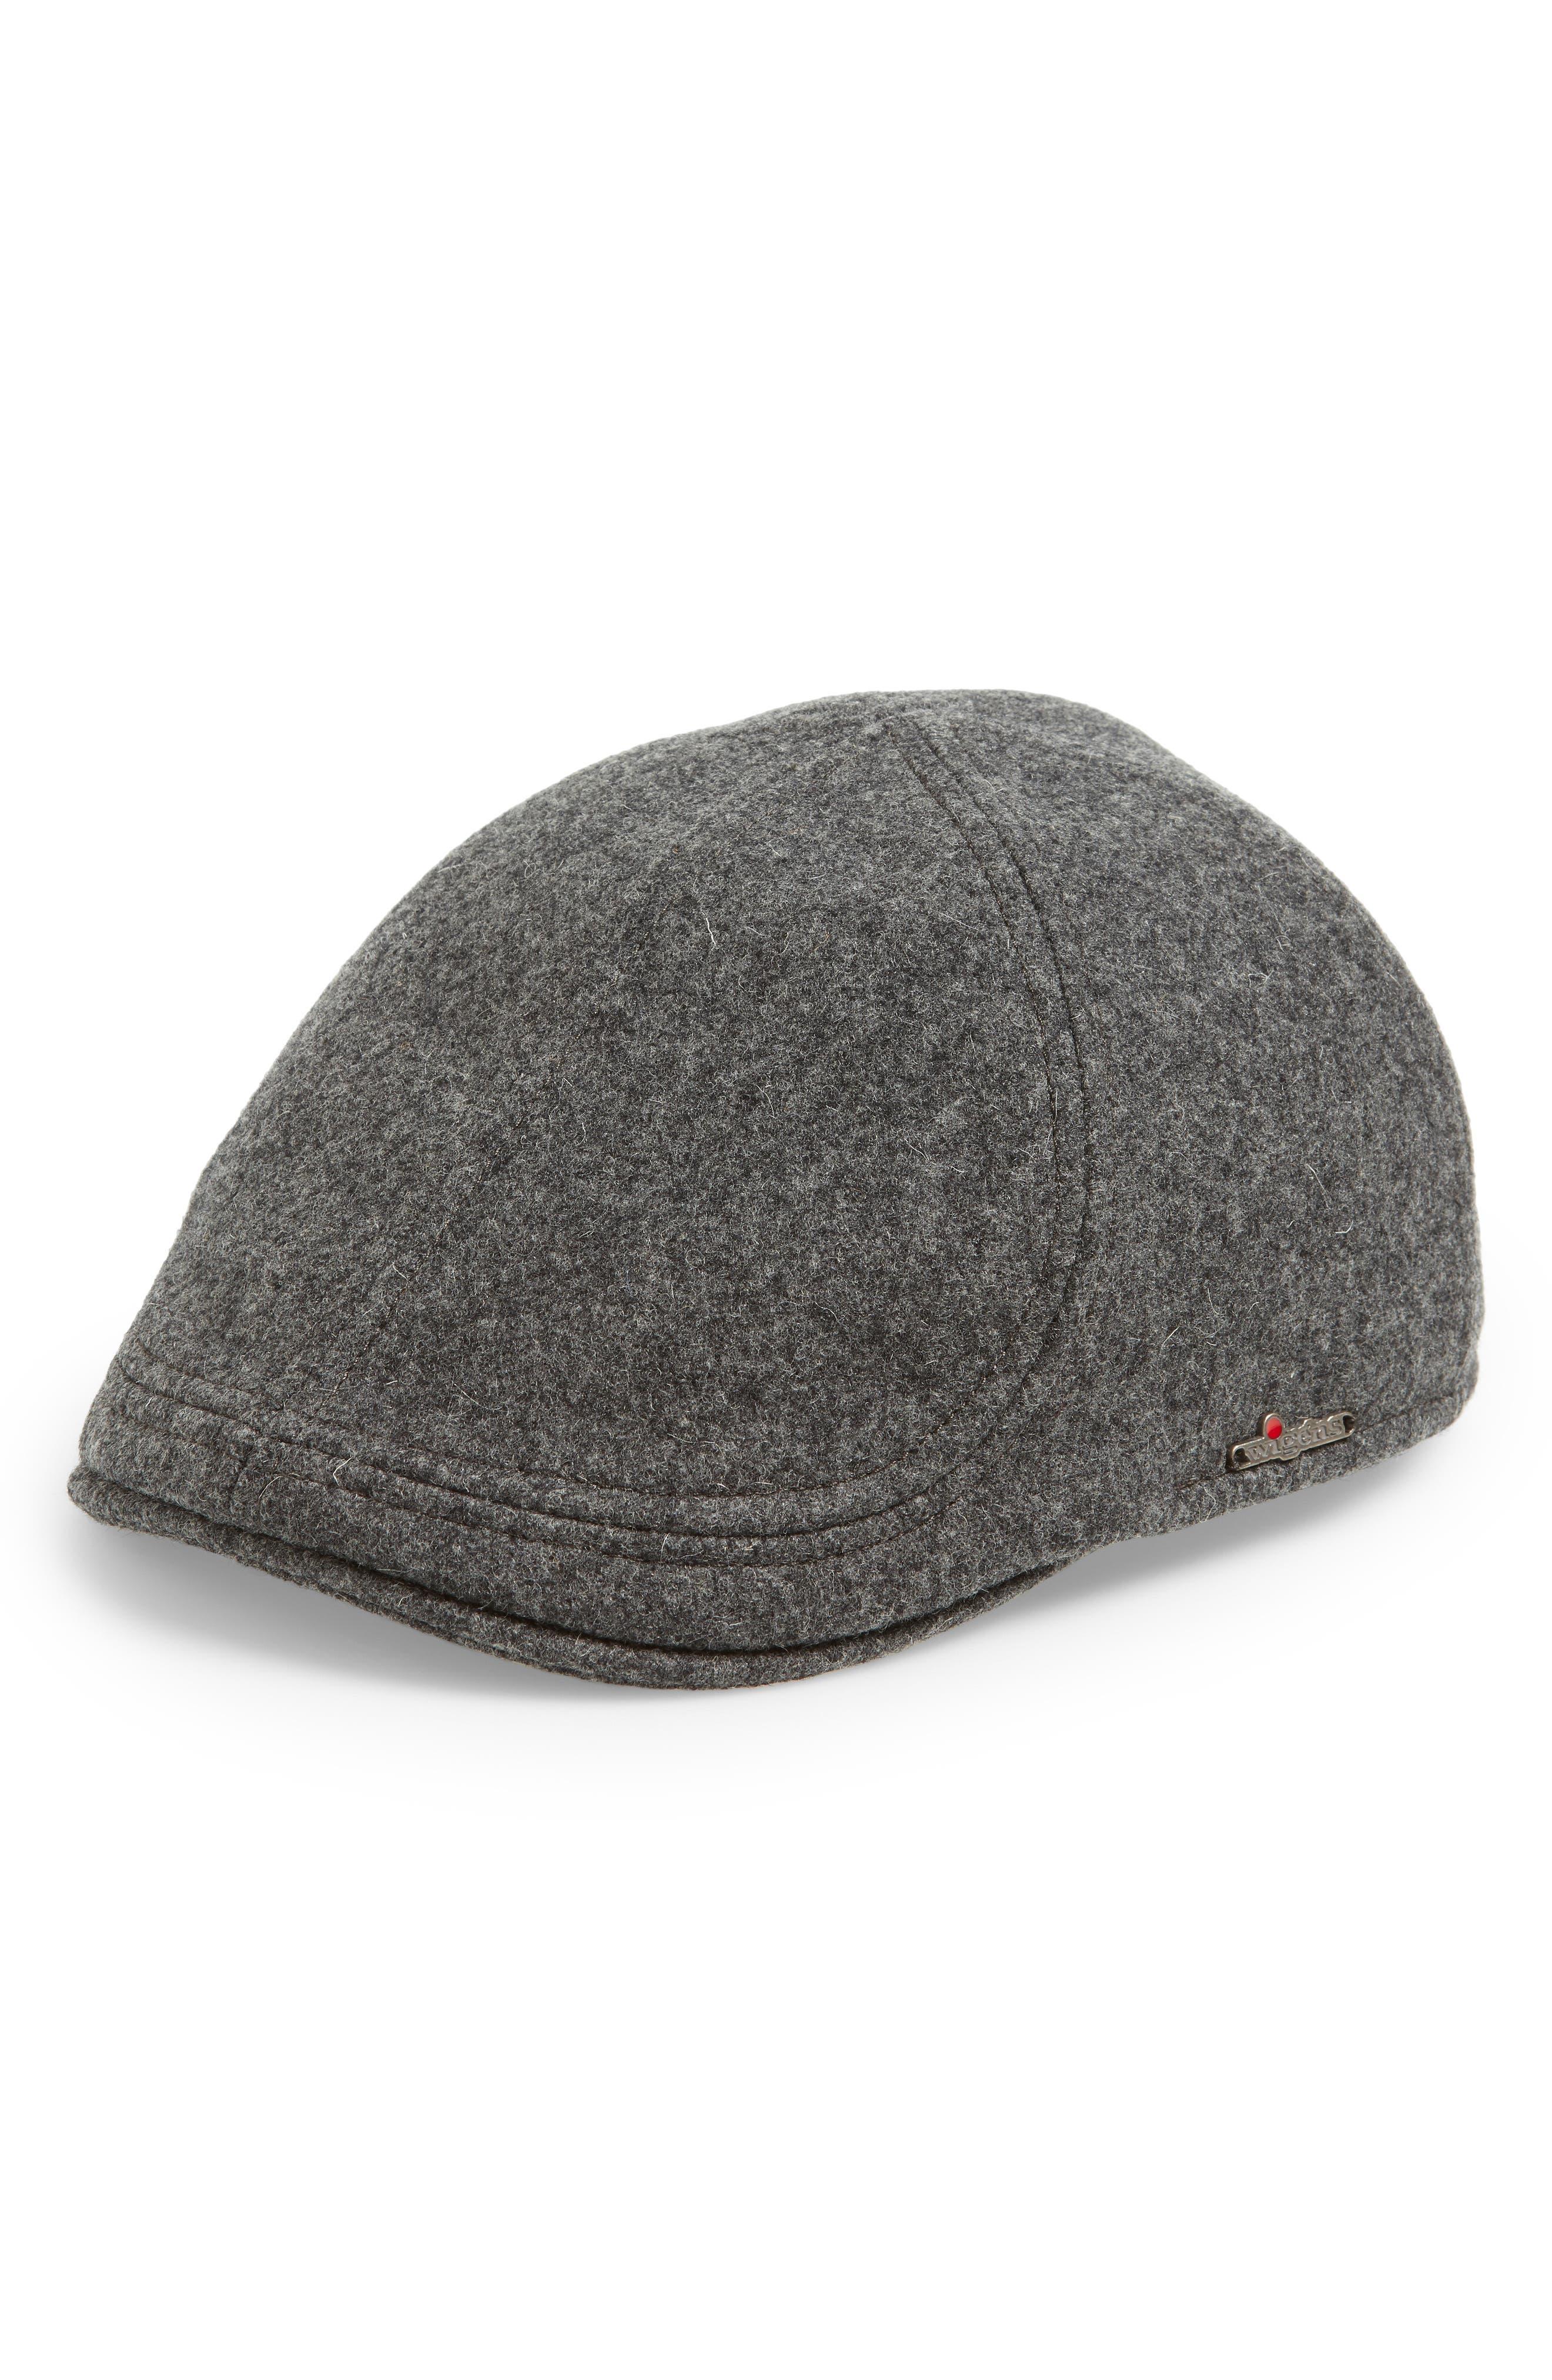 Wigens Wool Driving Cap